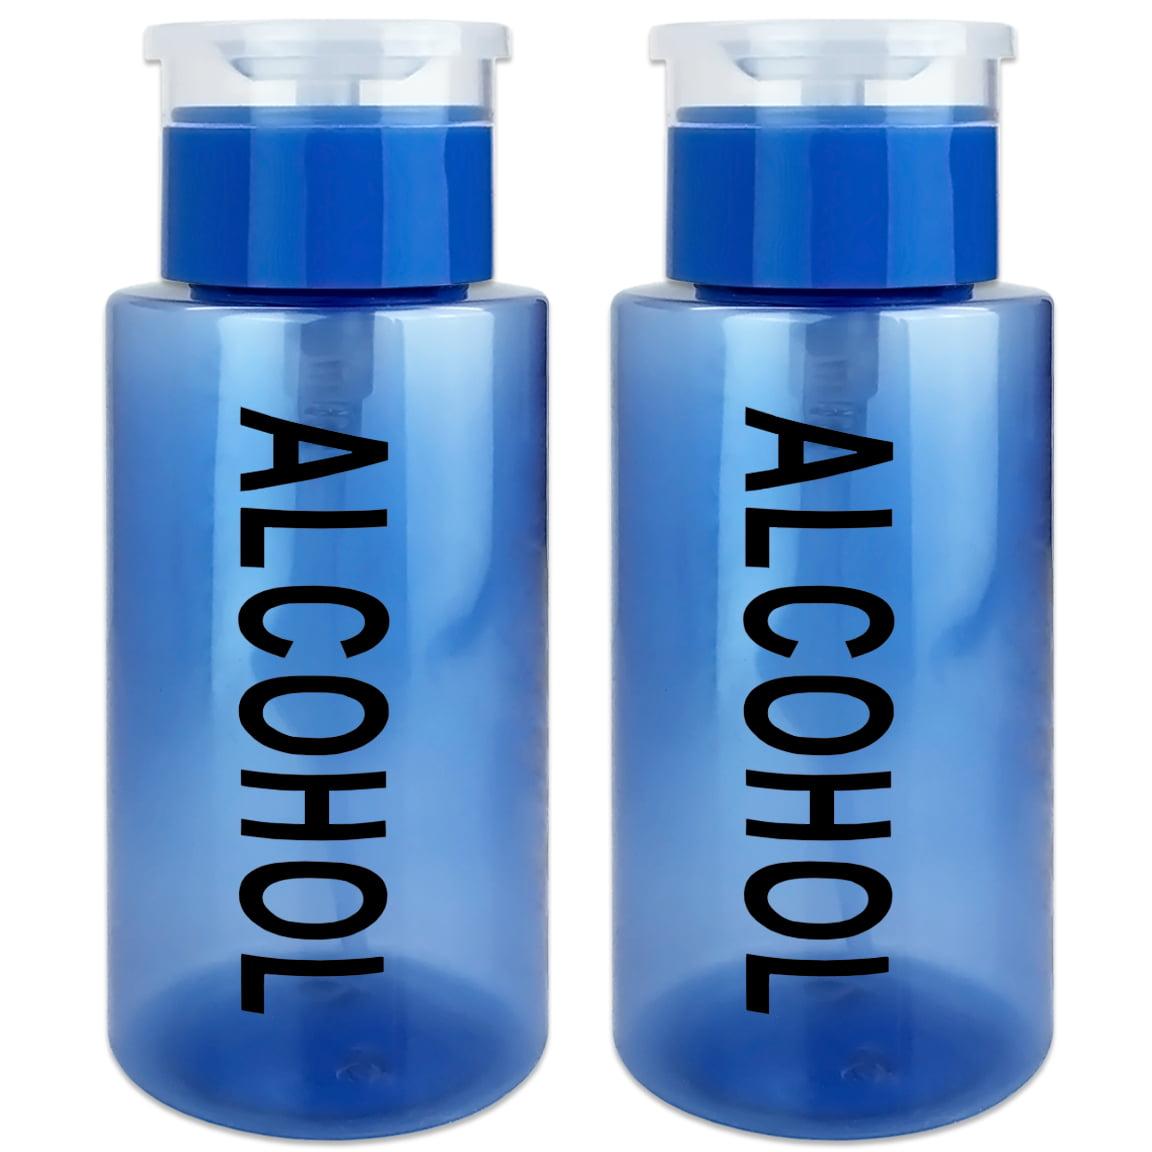 Pana High Quality 7oz Liquid Pump Dispenser With Alcohol Label - Teal (2 Bottles)